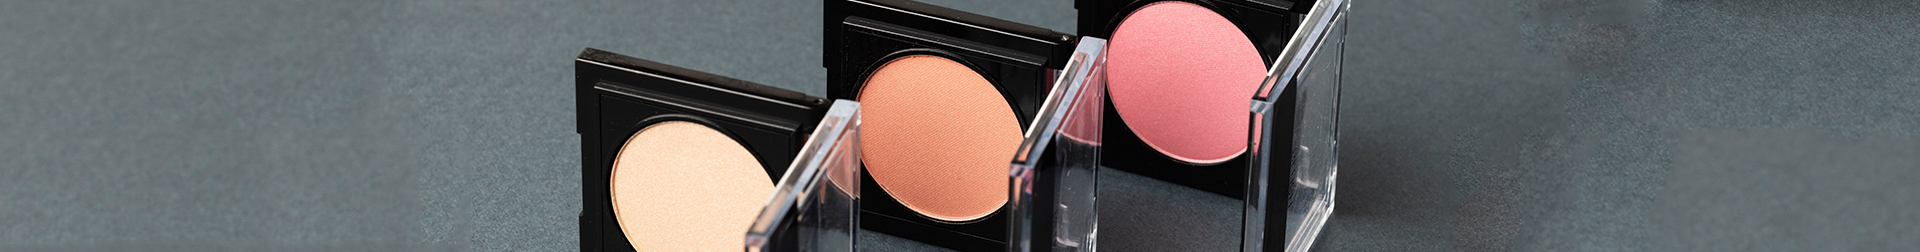 Makeup Products | Buy Face Blush Online | AromaCraze